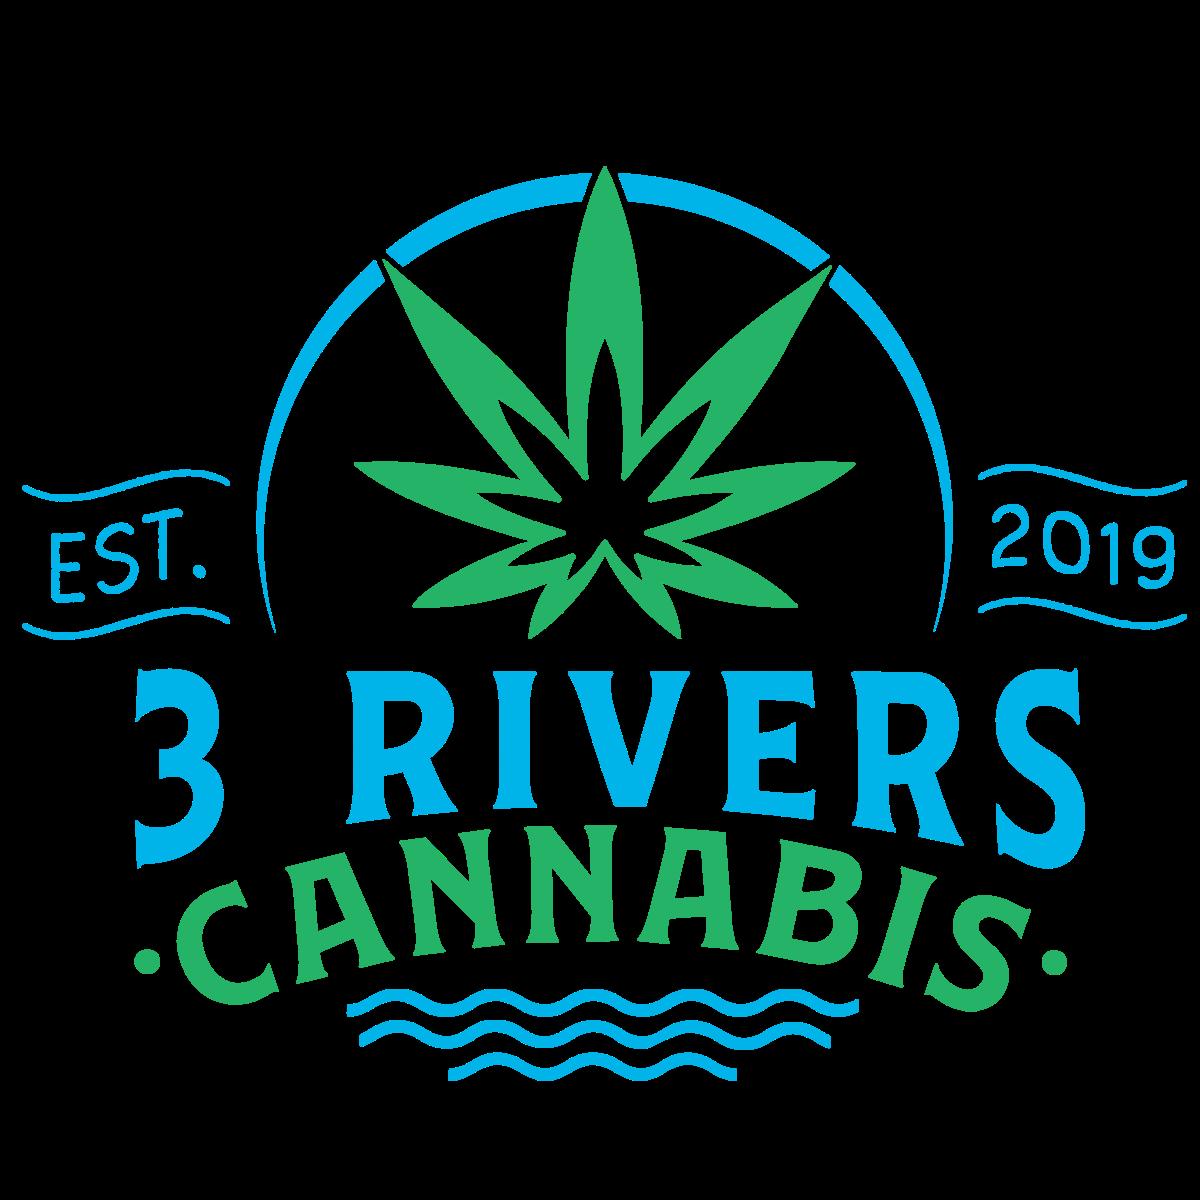 T shirt for Recreational Cannabis Company